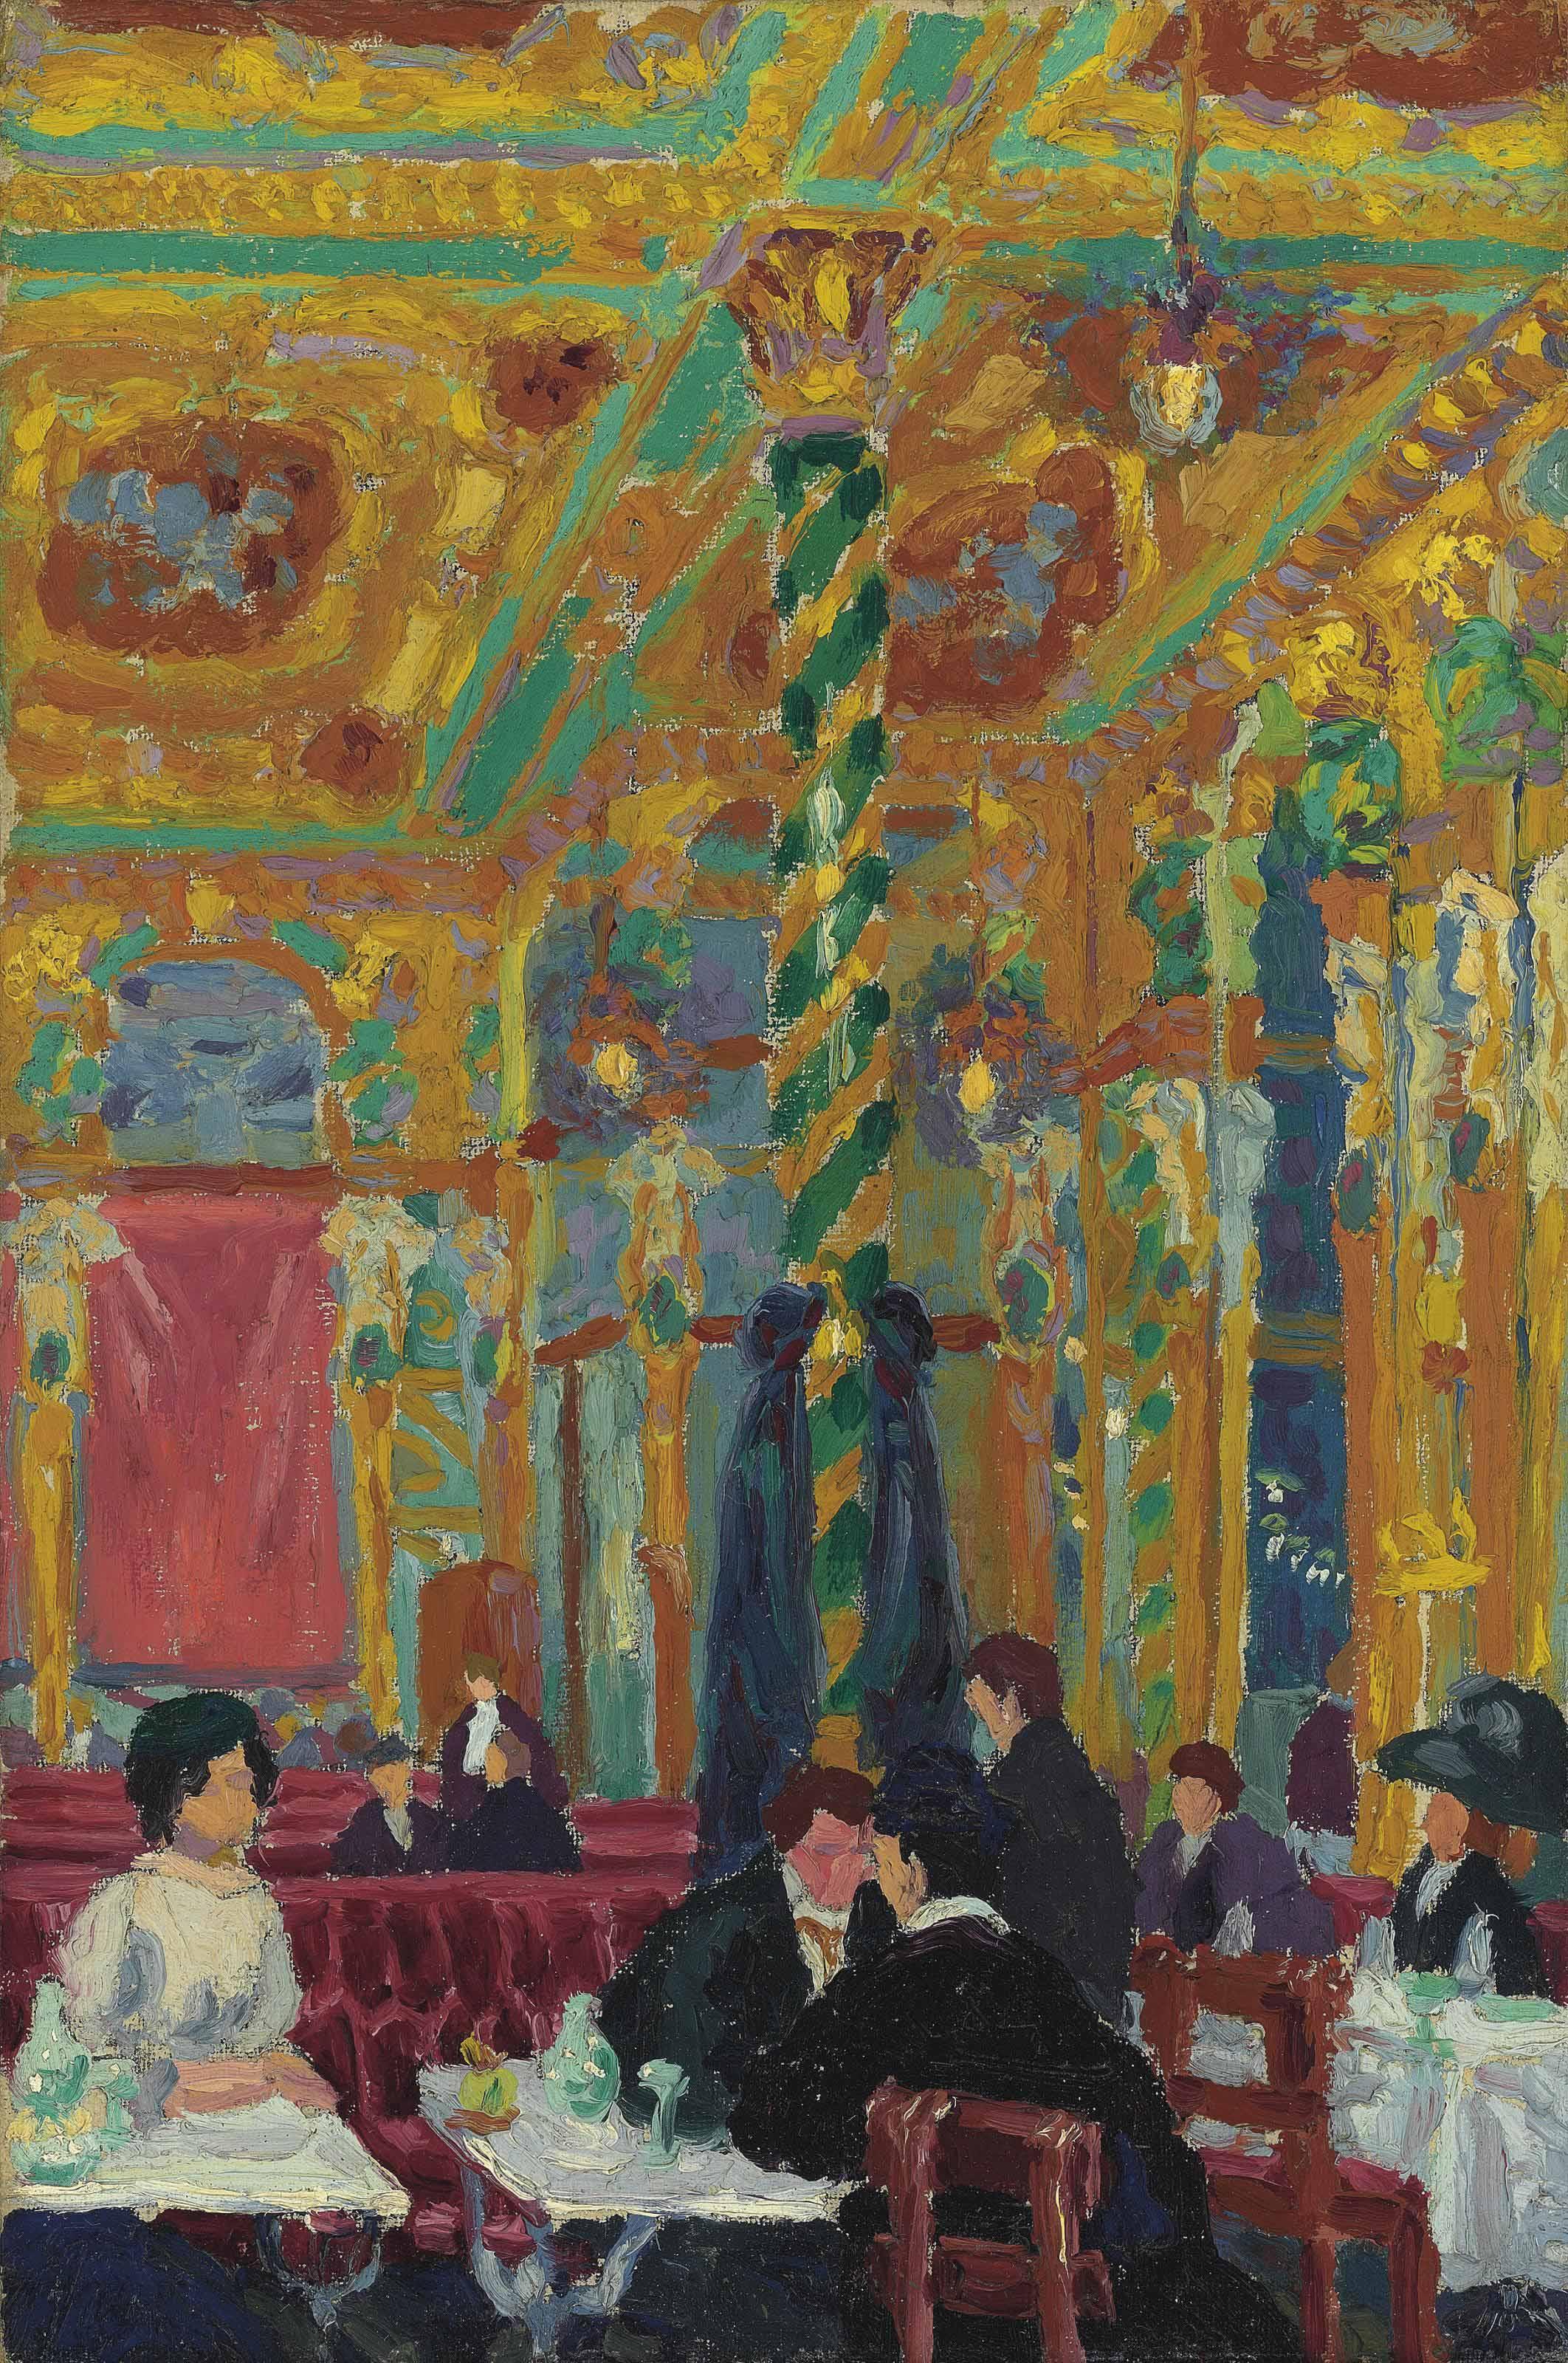 The Café Royal